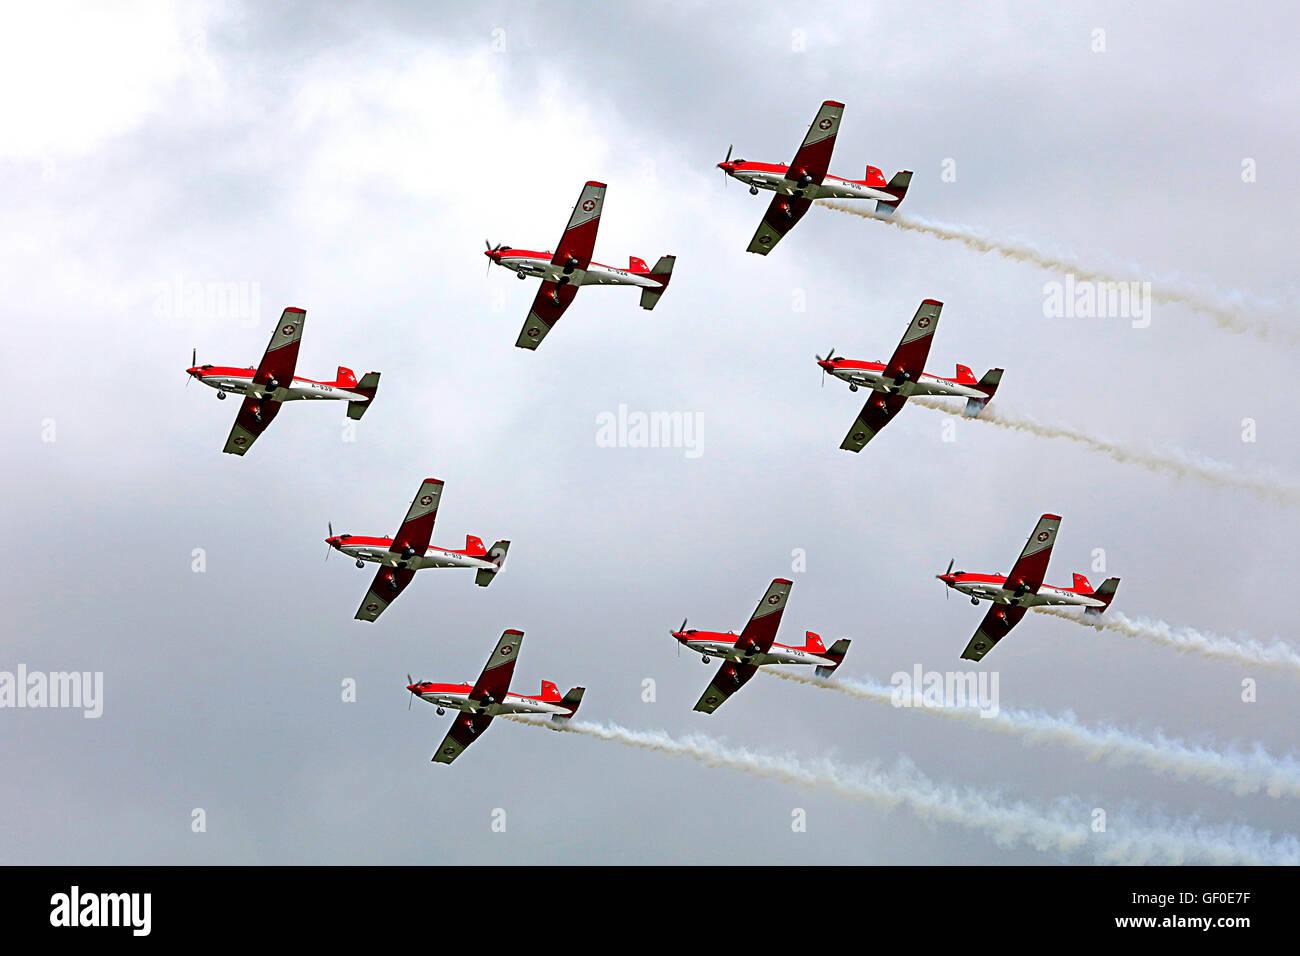 Swiss PC-7 Aerobatic team - Stock Image